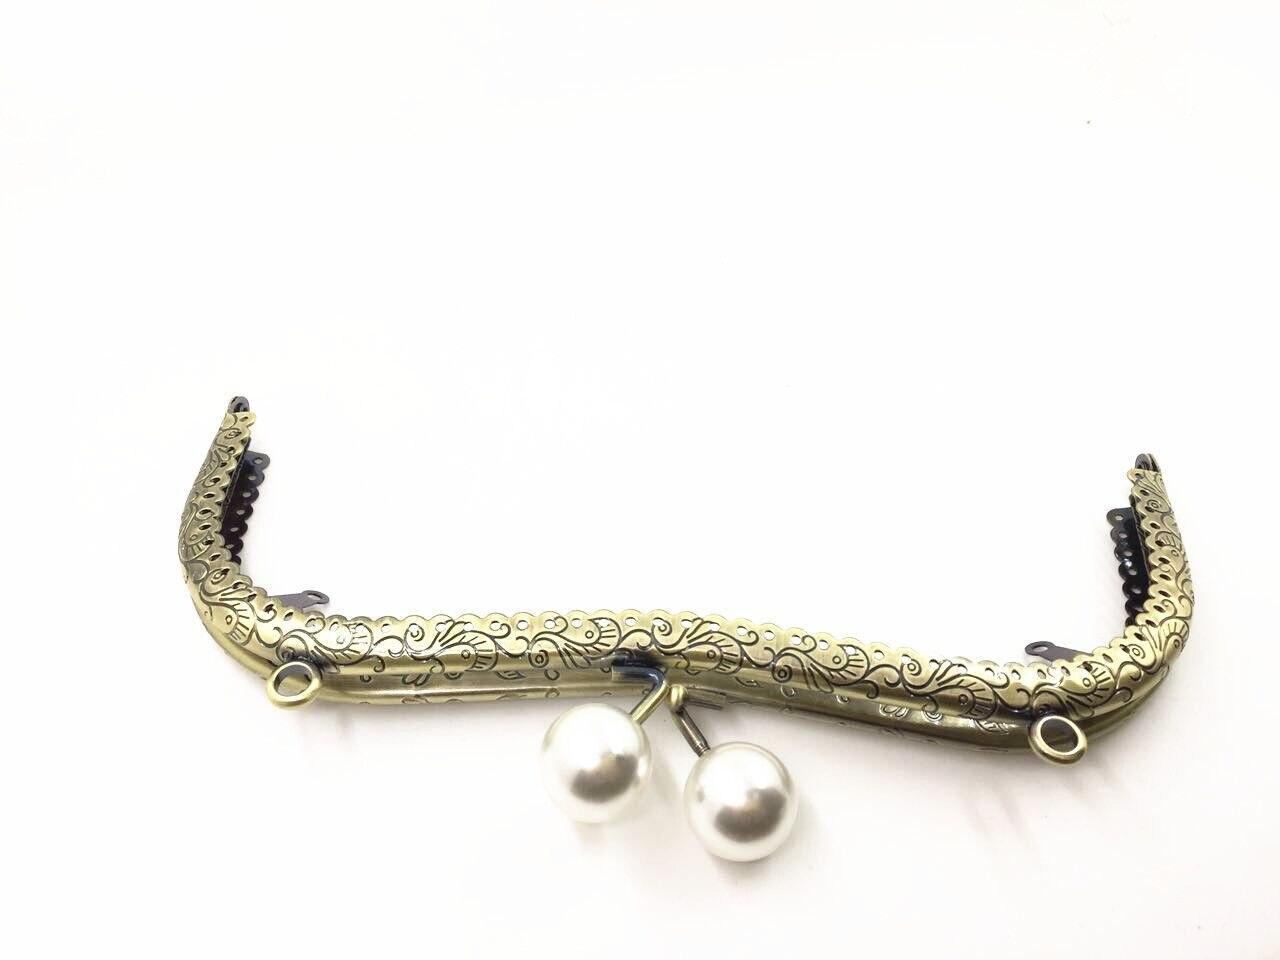 HAOFA 20cm Bronze Metal M Shhape Bag Frame Vintage Embossing Lace Pearl Head Purse Frame DIY Bag Frame Kiss Clasp Purse Frame